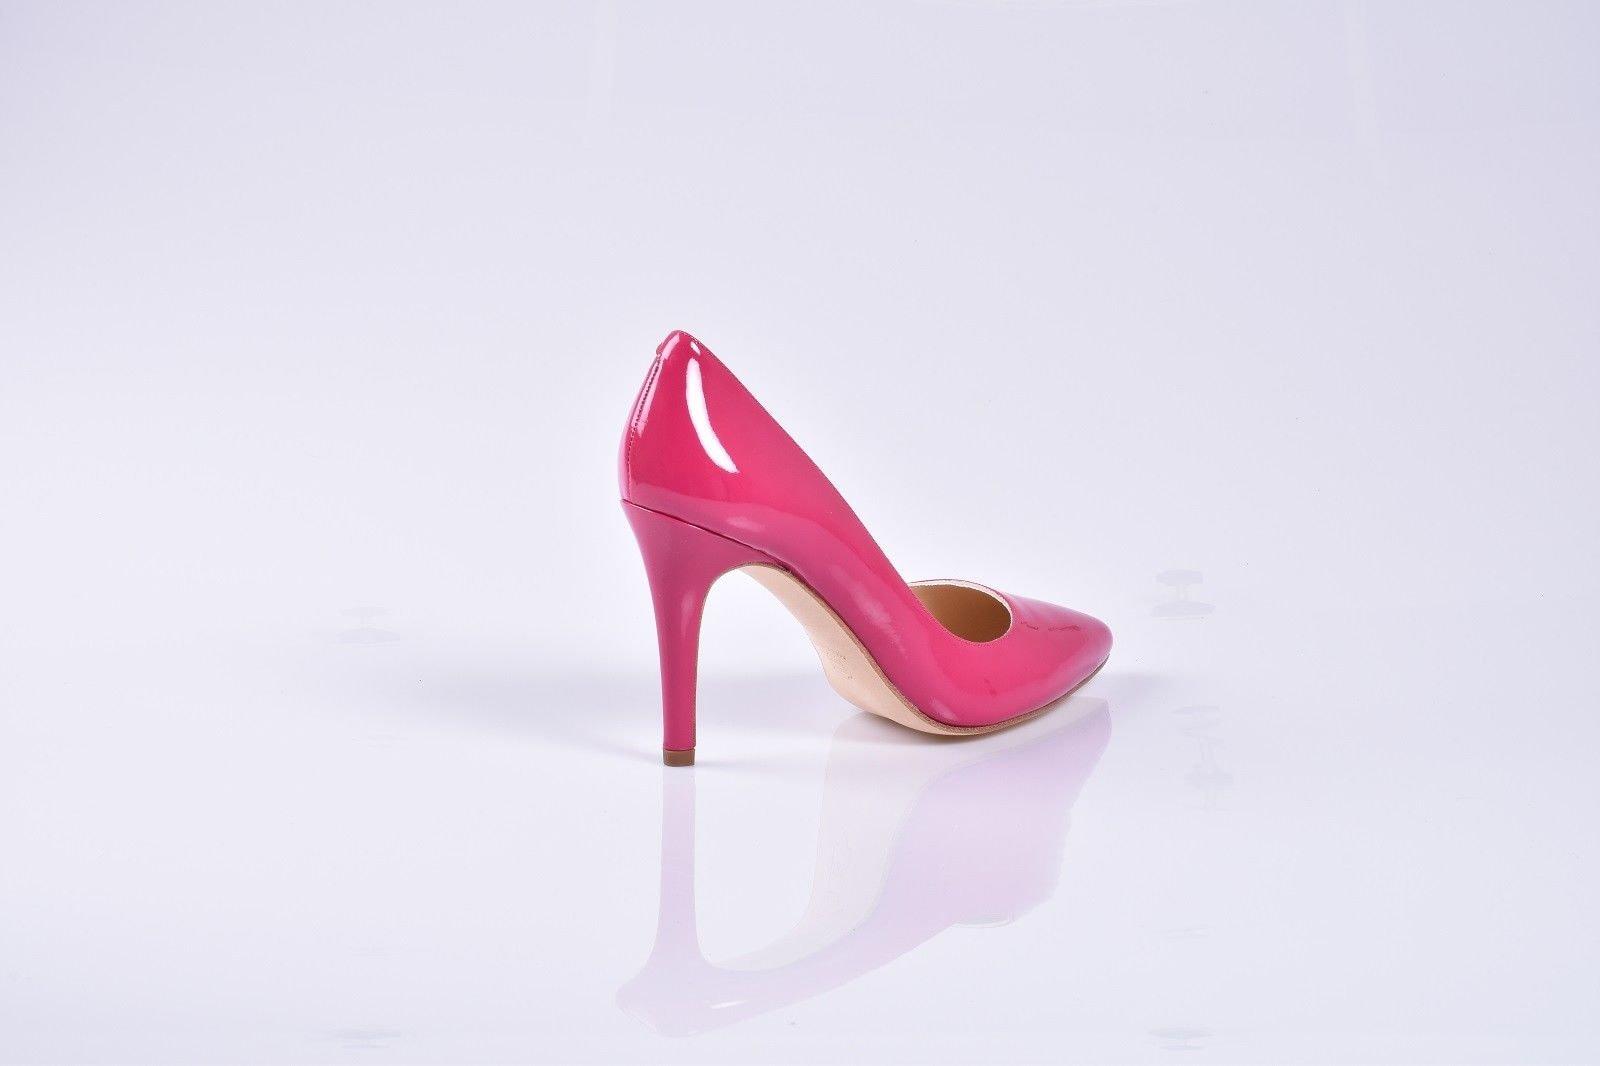 Anna neuf Milan Veronica brevets pompes classique en rose tout neuf Anna 4631c1